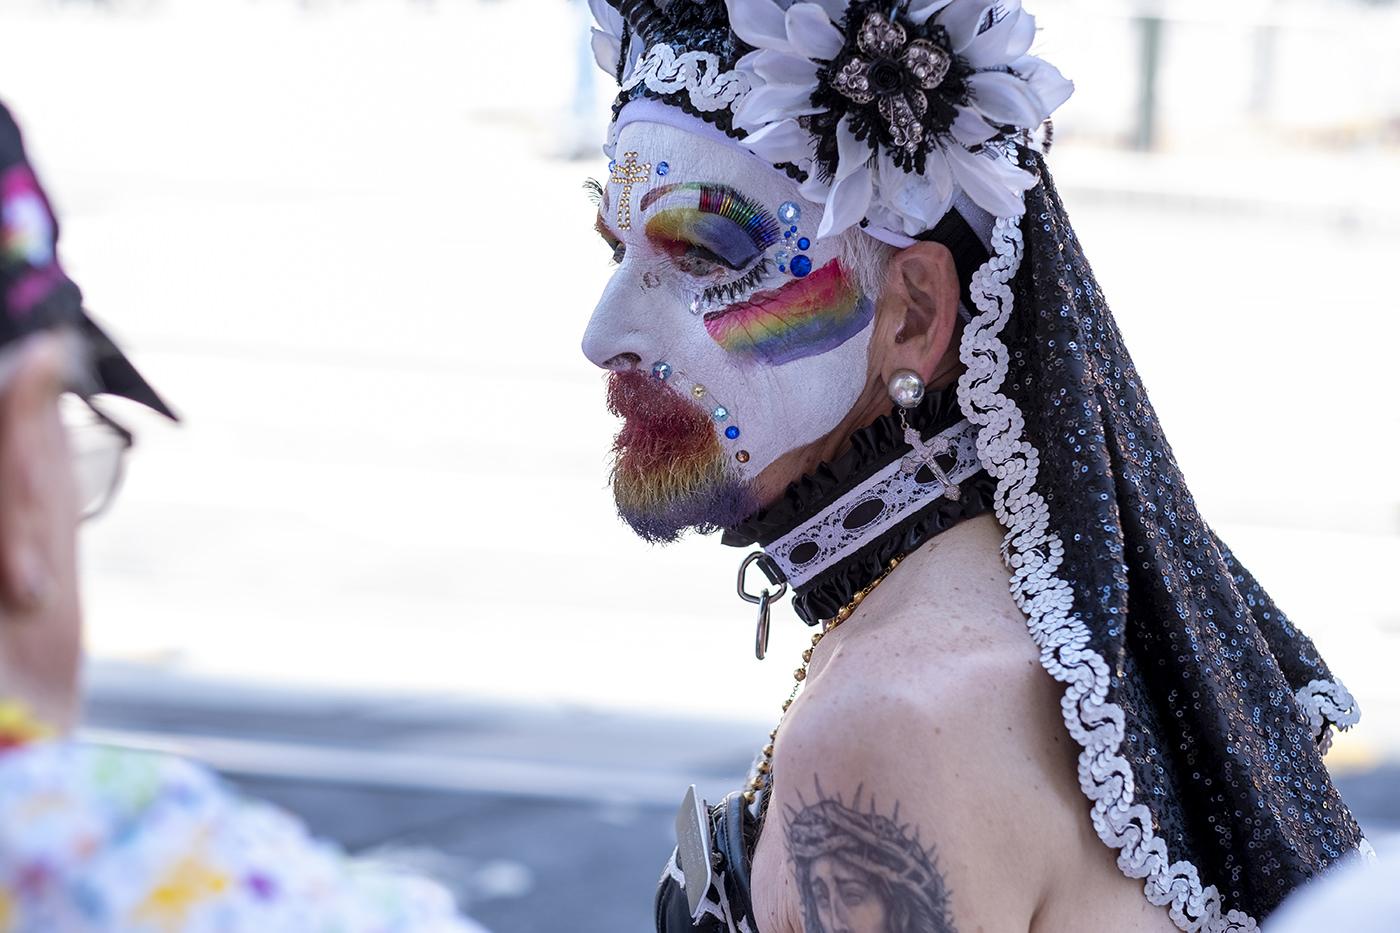 sf-pride-david-mullin-26.jpg